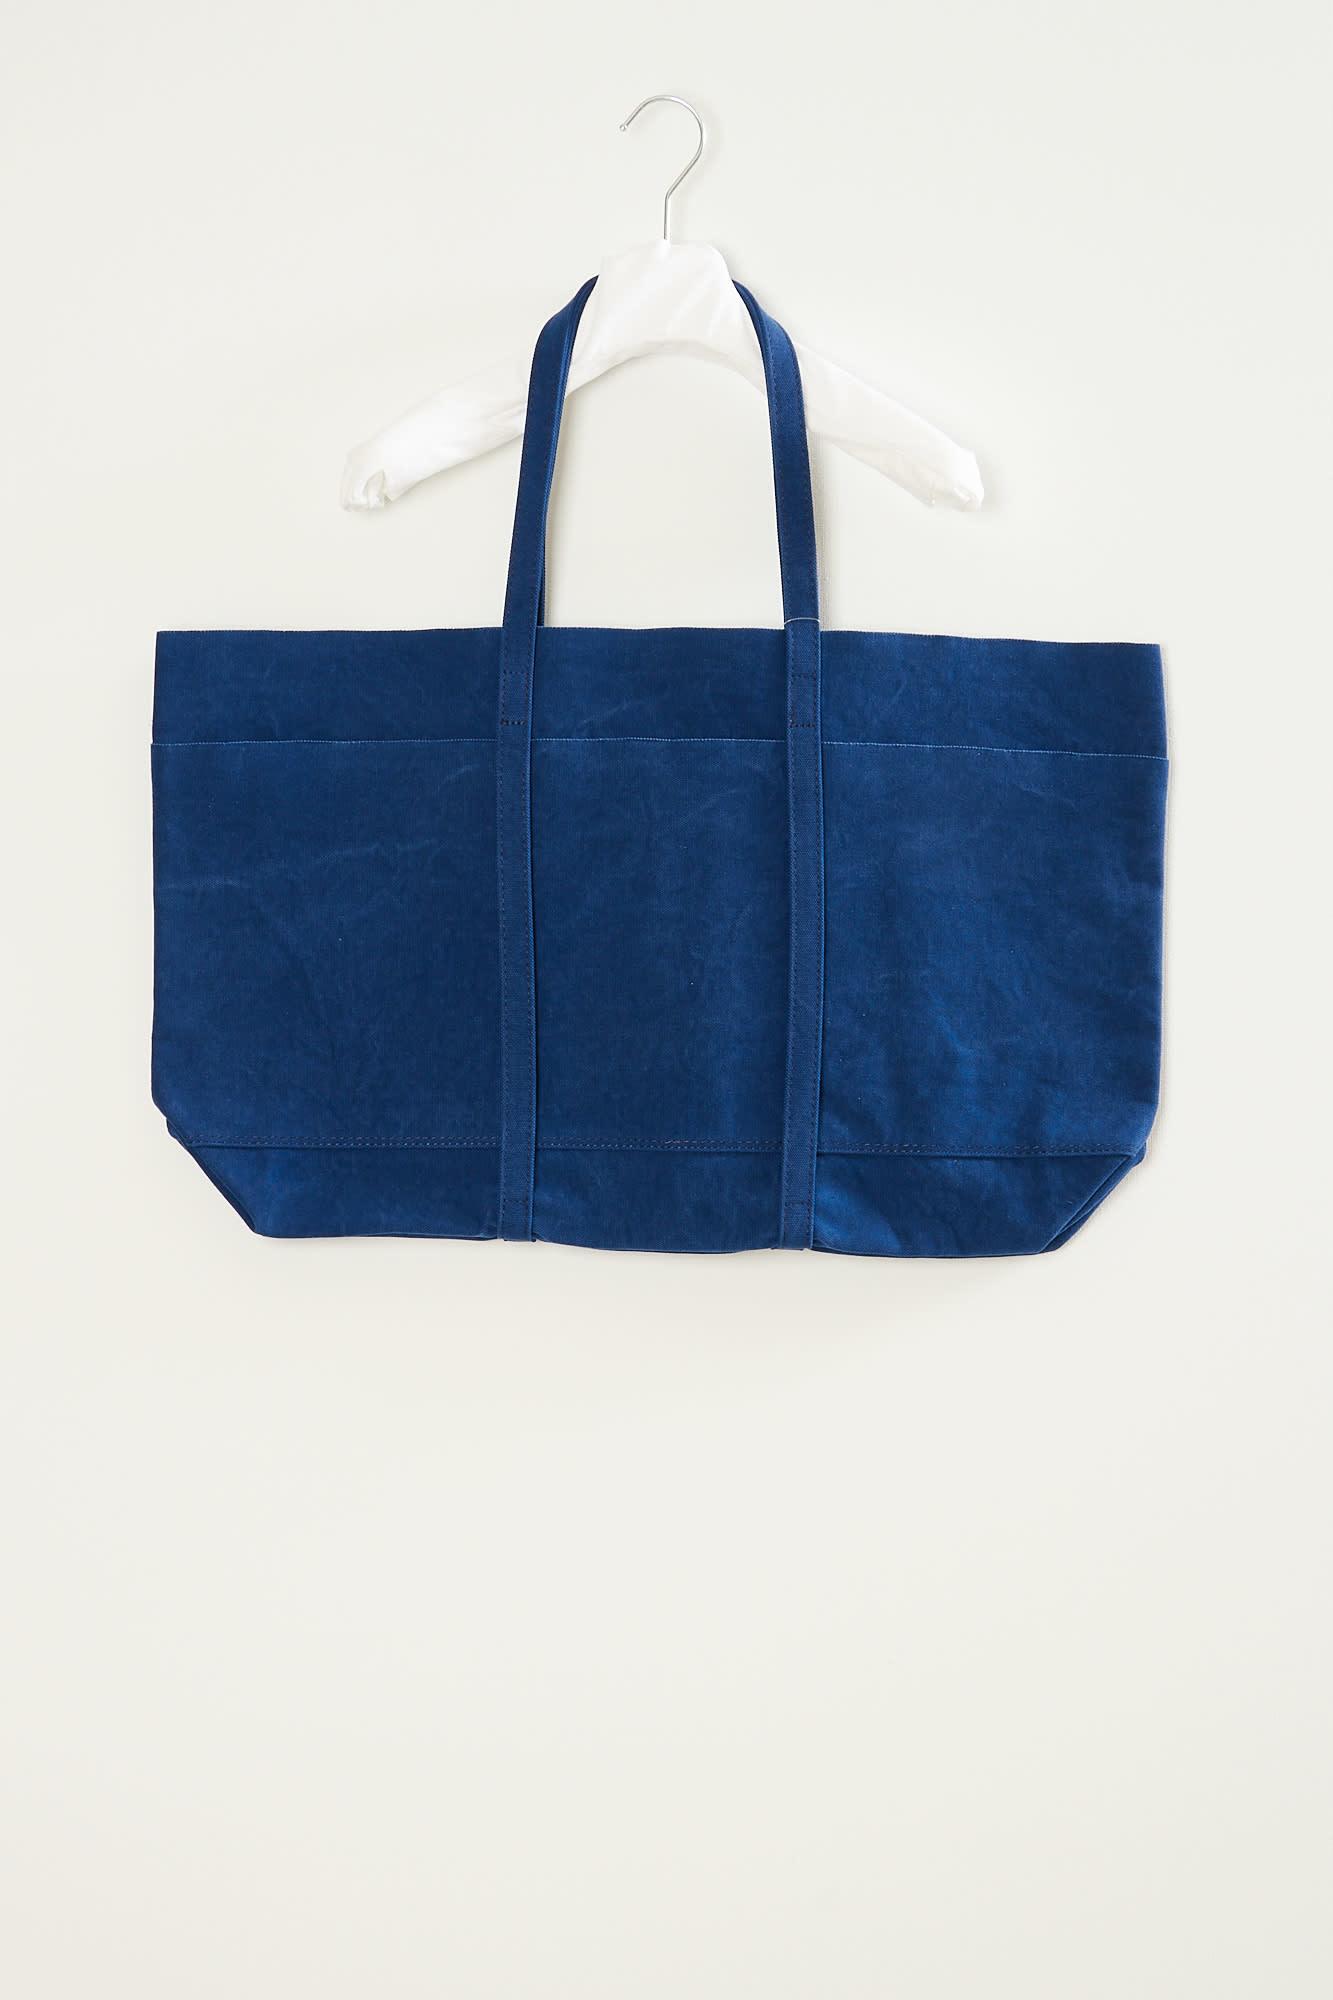 Amiacalva - Washed canvas 6 pocket tote large